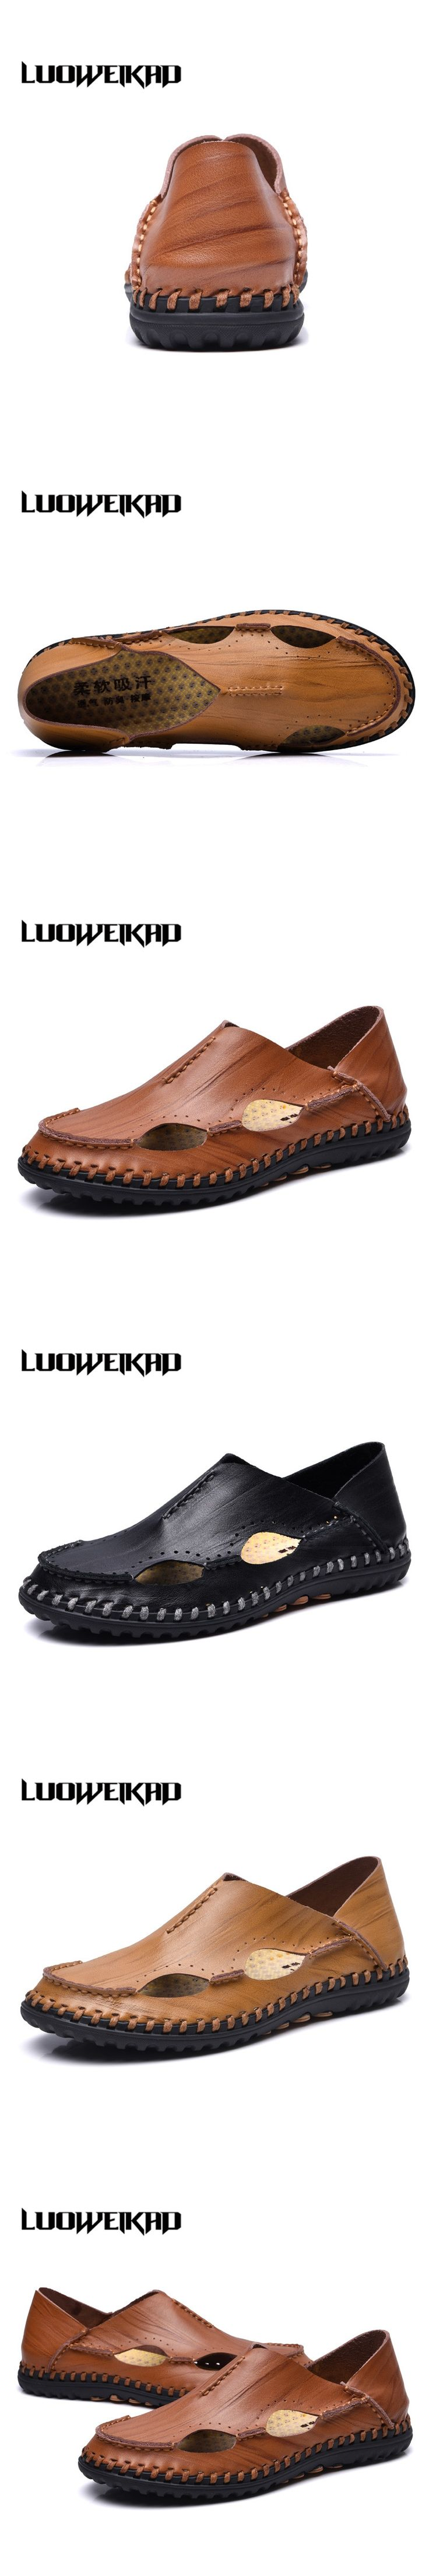 2017 Summer Fashion Zapatilles Hombre Gladiator Sandals Men rubber sandals for swimming Cow Split leather social men sandals